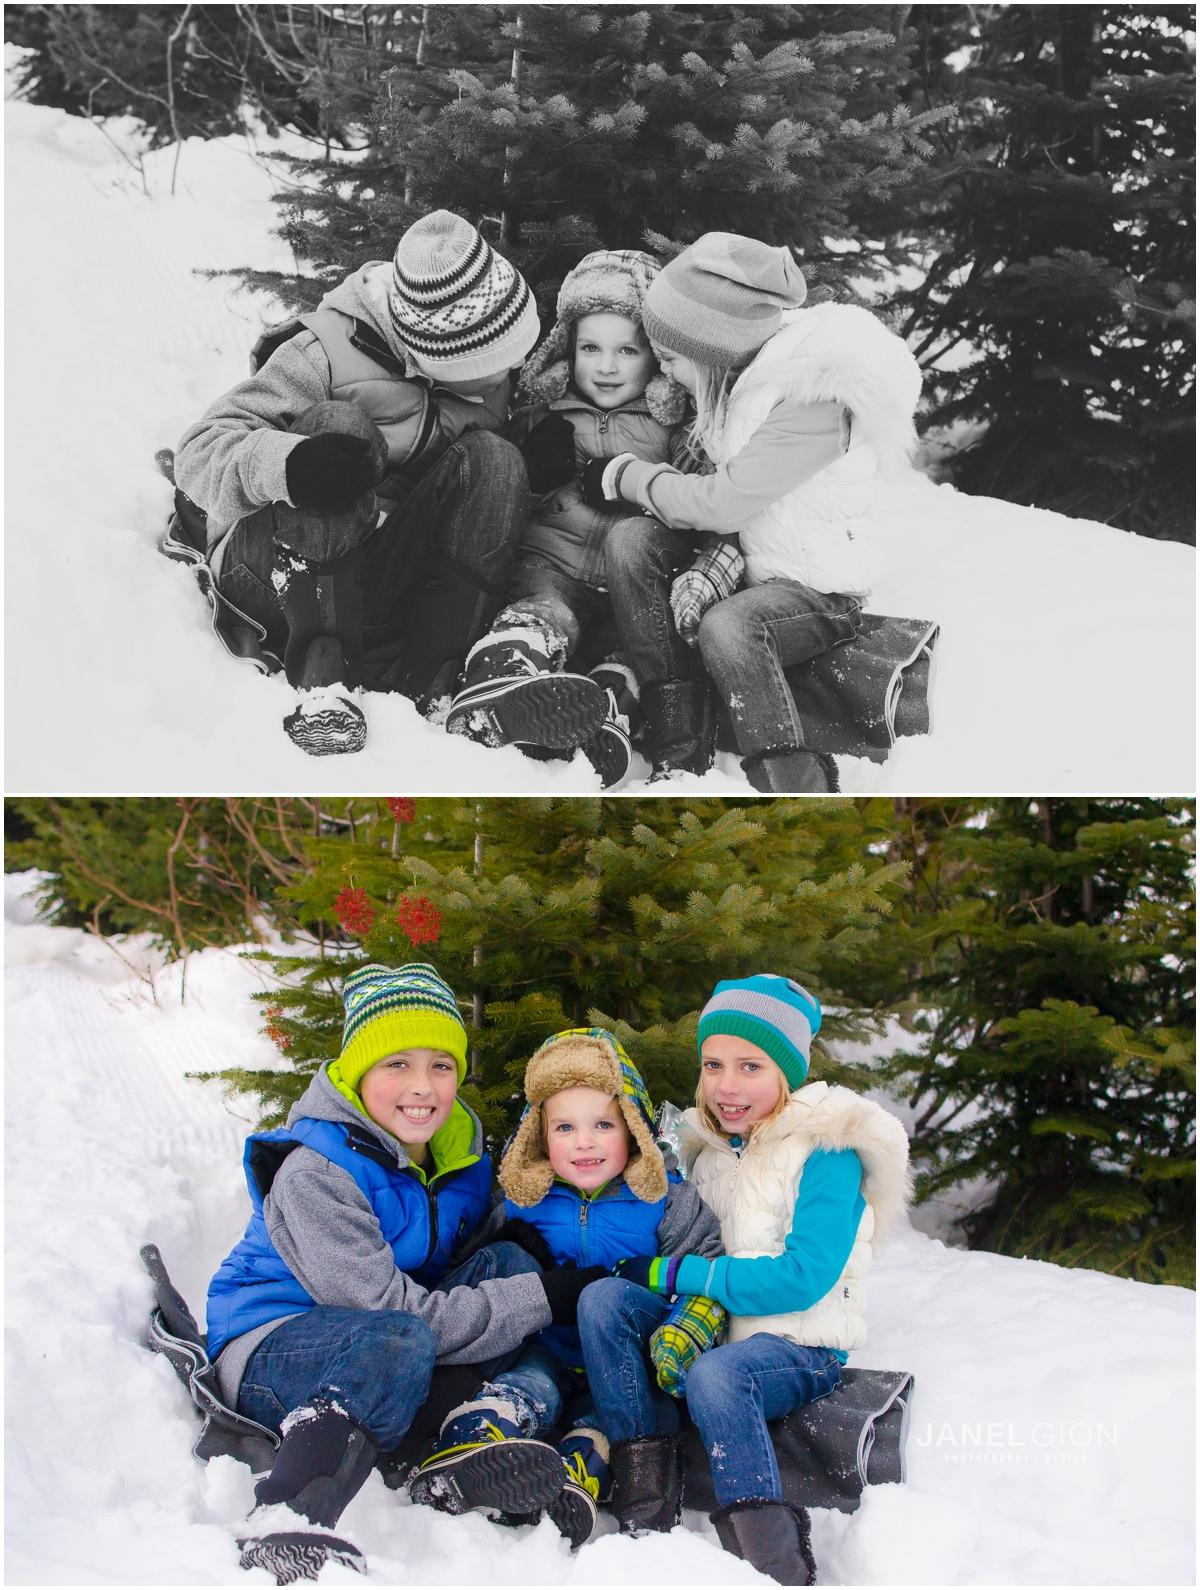 Sandpoint Idaho Child Snow Photography